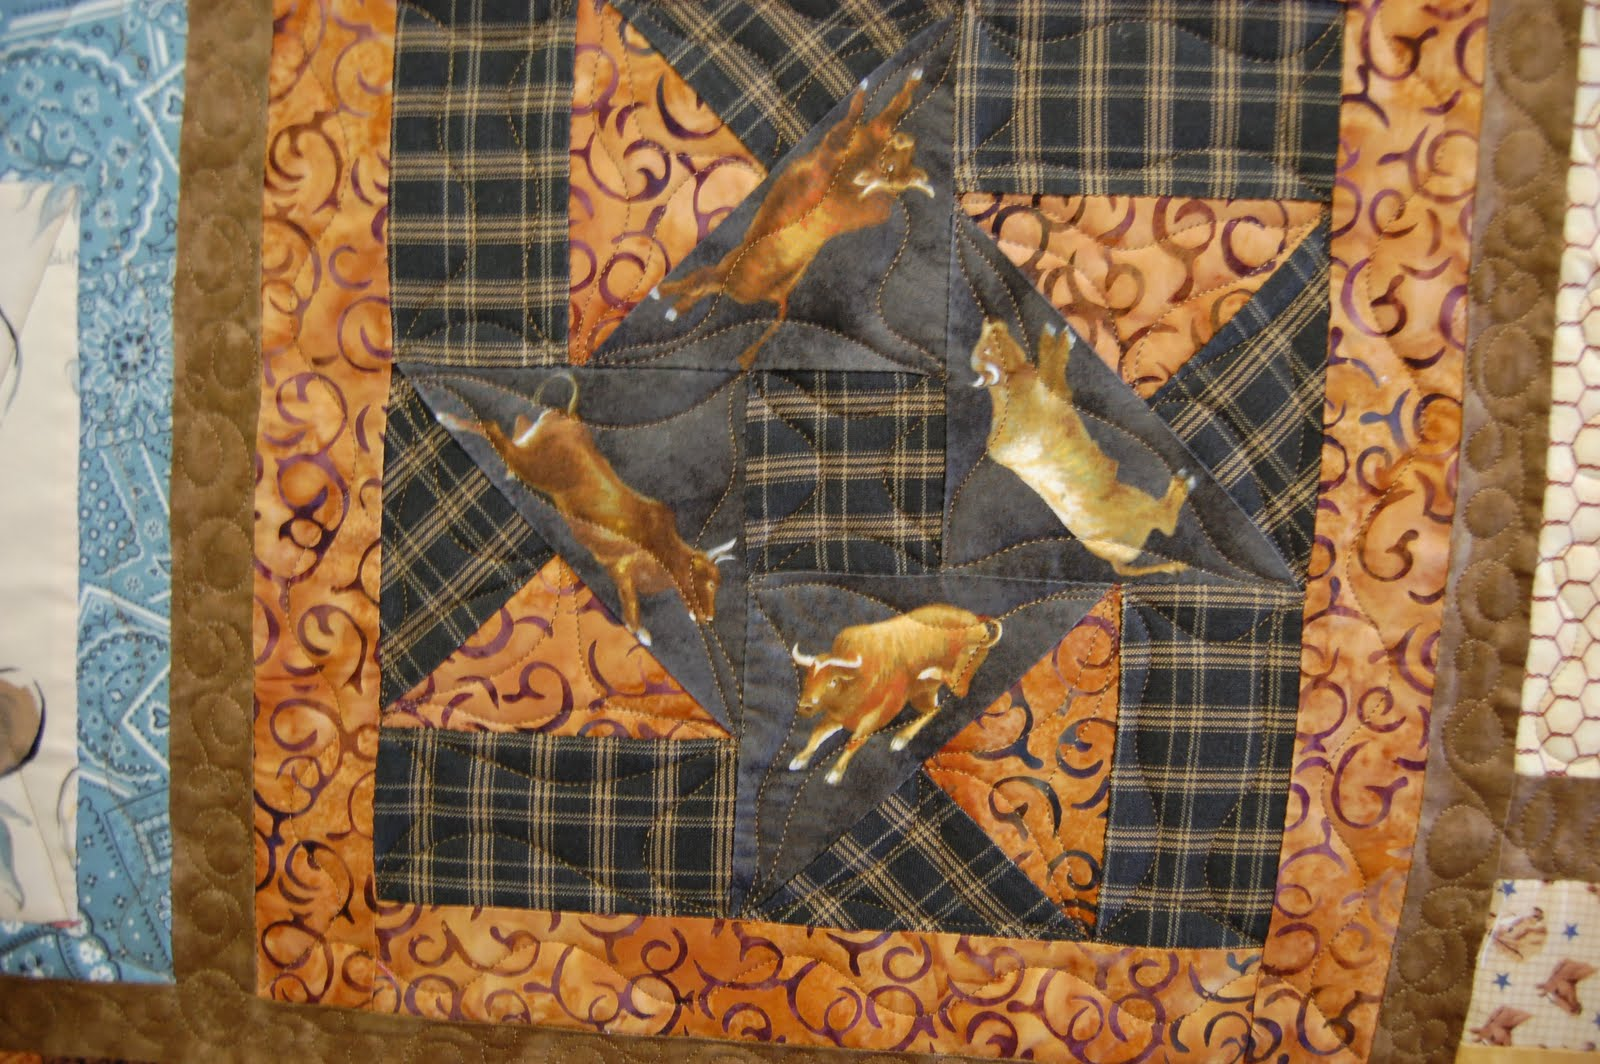 Creative Longarm Quilting by Karen Marchetti: the Cowboy Quilt : cowboy quilt - Adamdwight.com